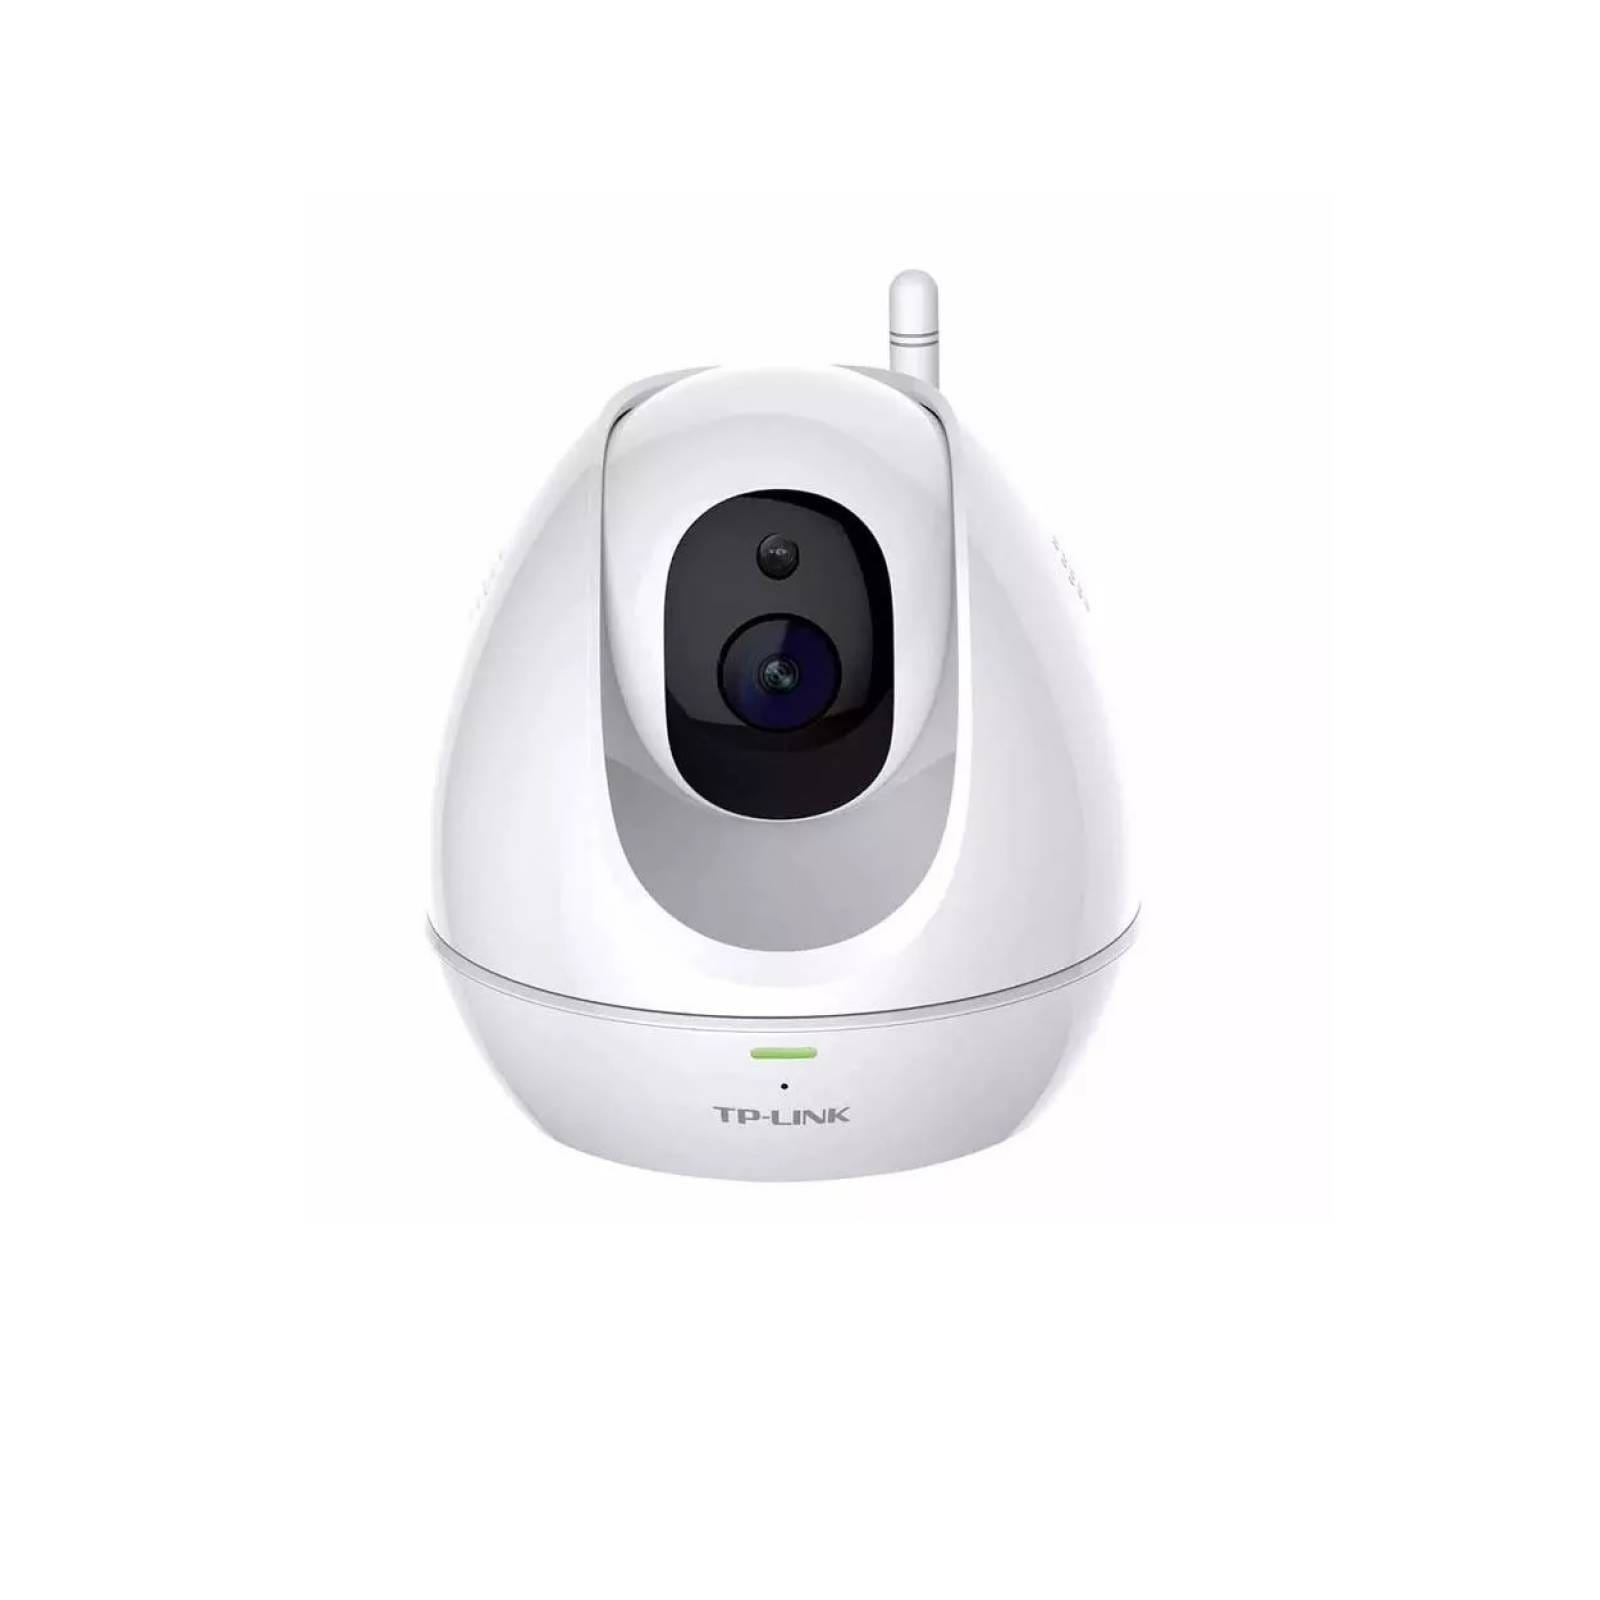 Camara Vigilancia Tp-link Cloud C/movimiento Dia/noche Nc450